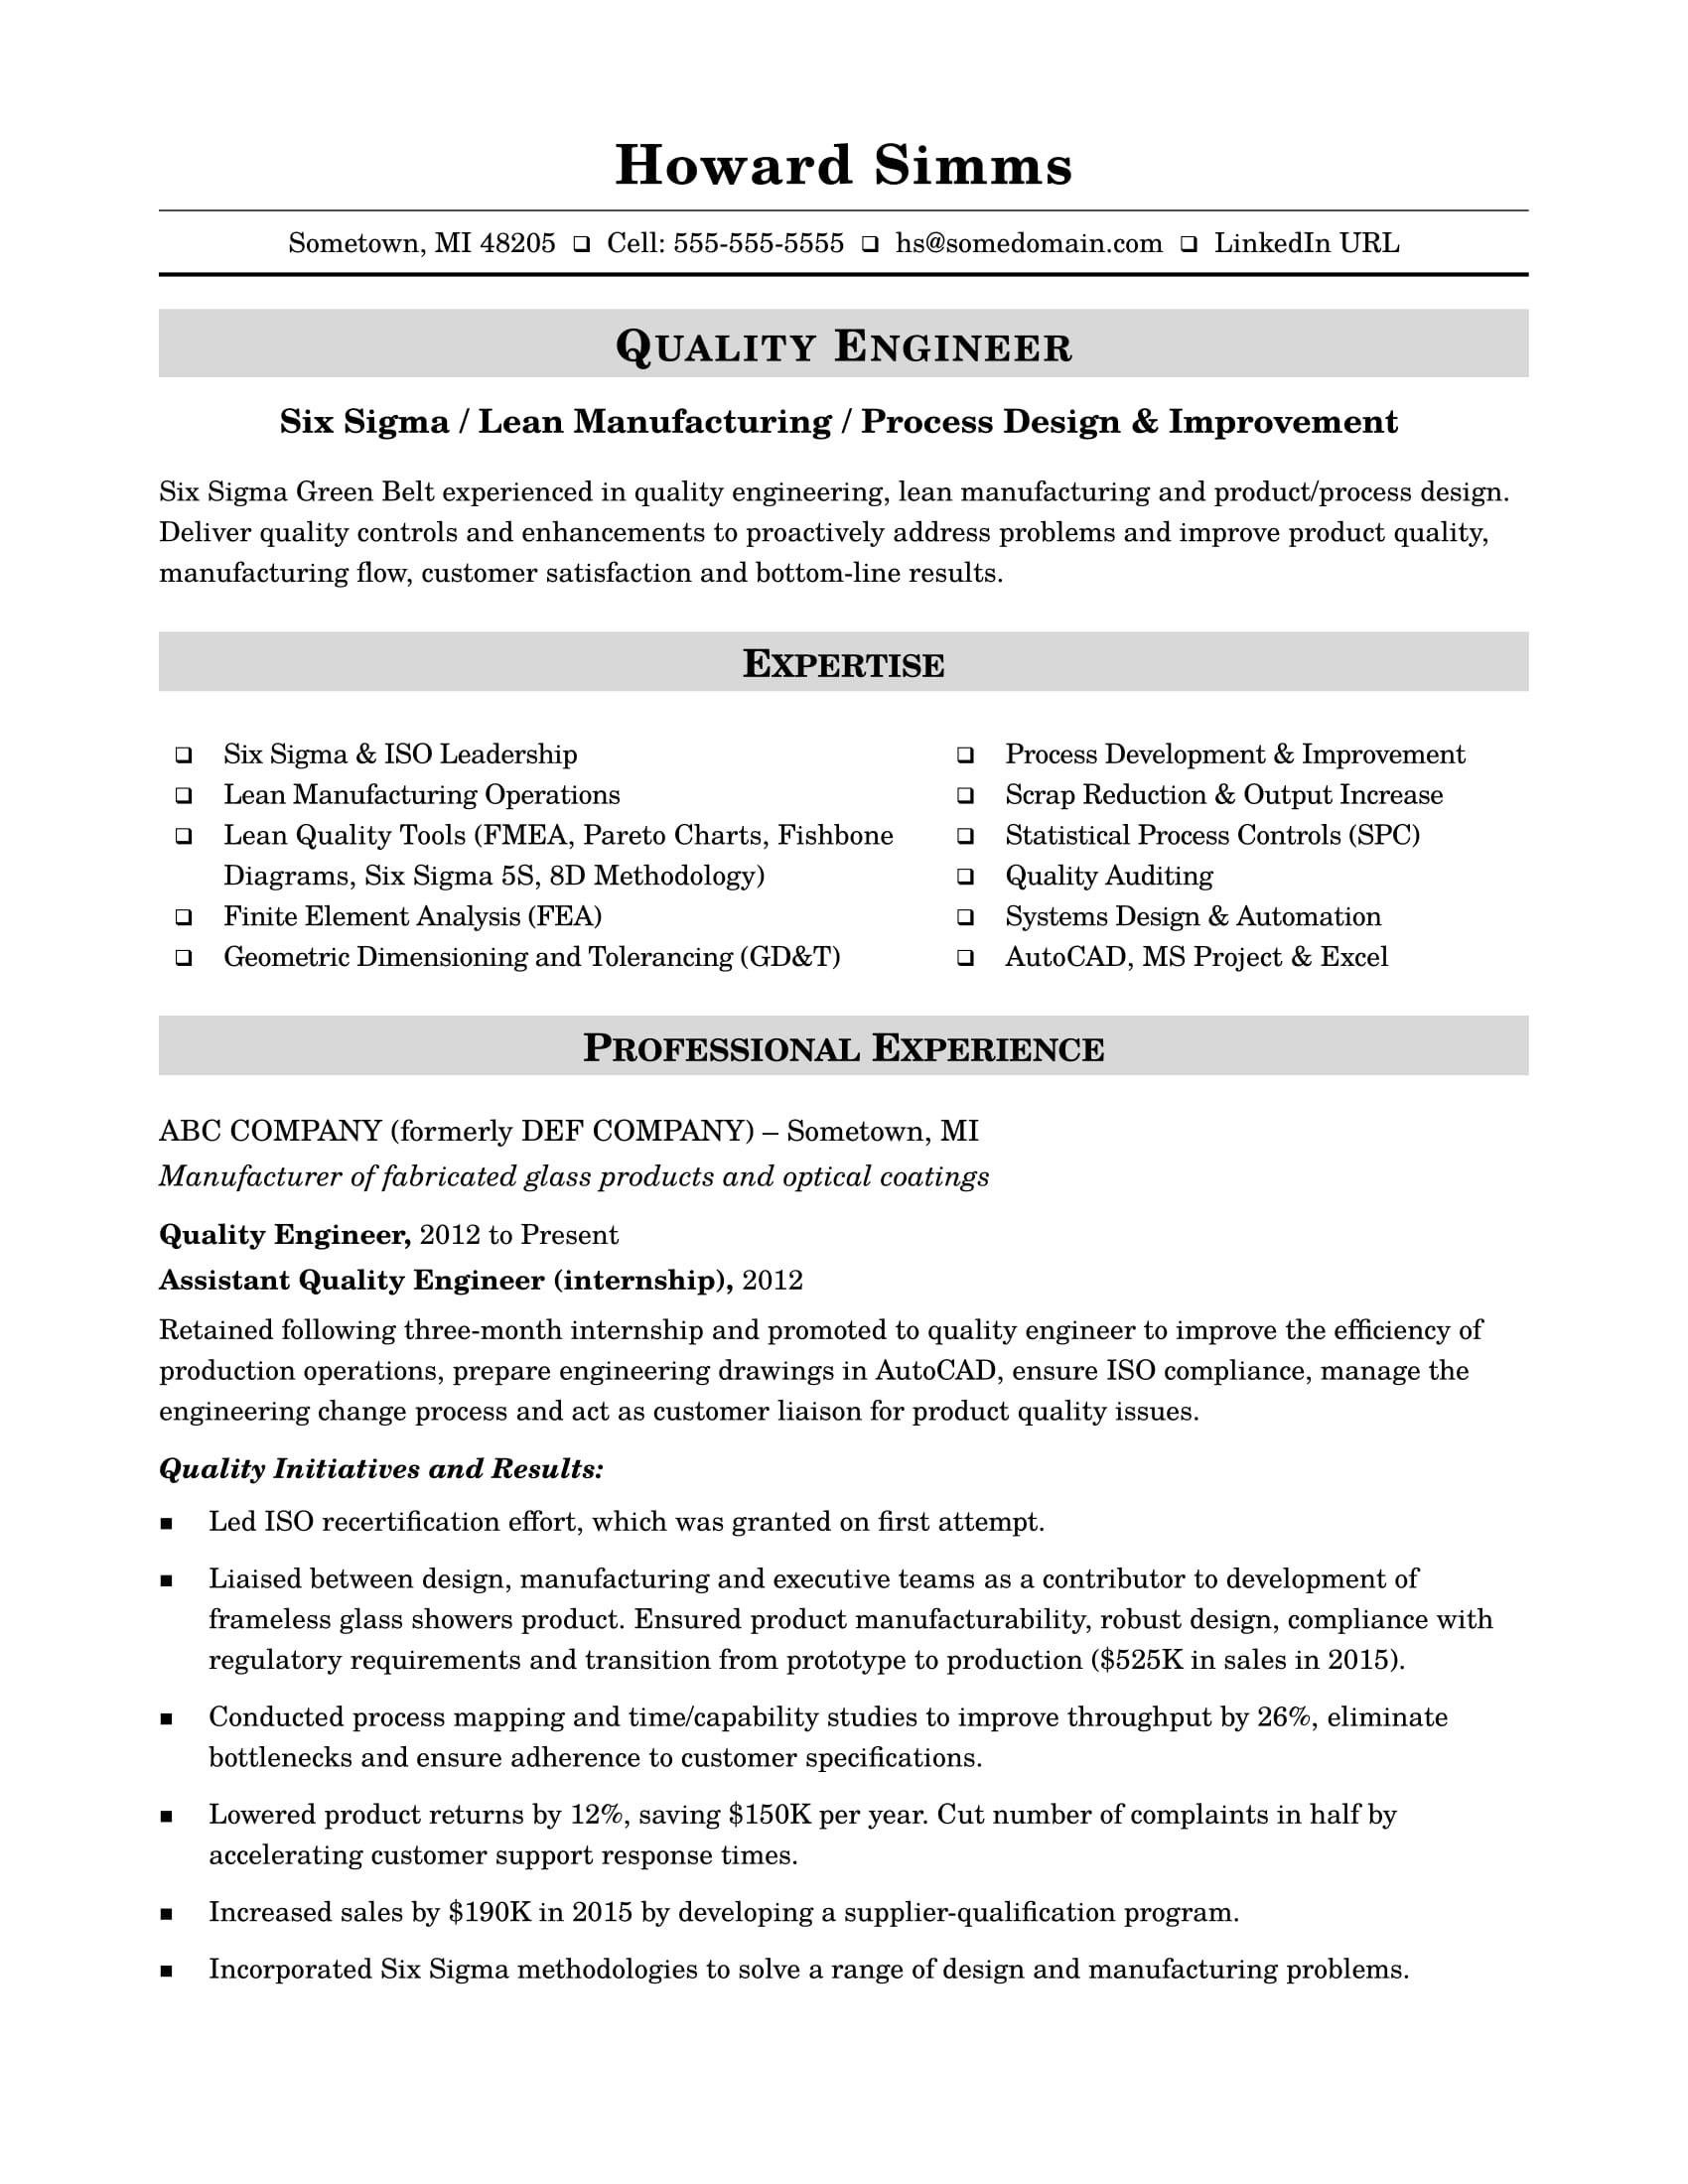 quality engineer midlevel